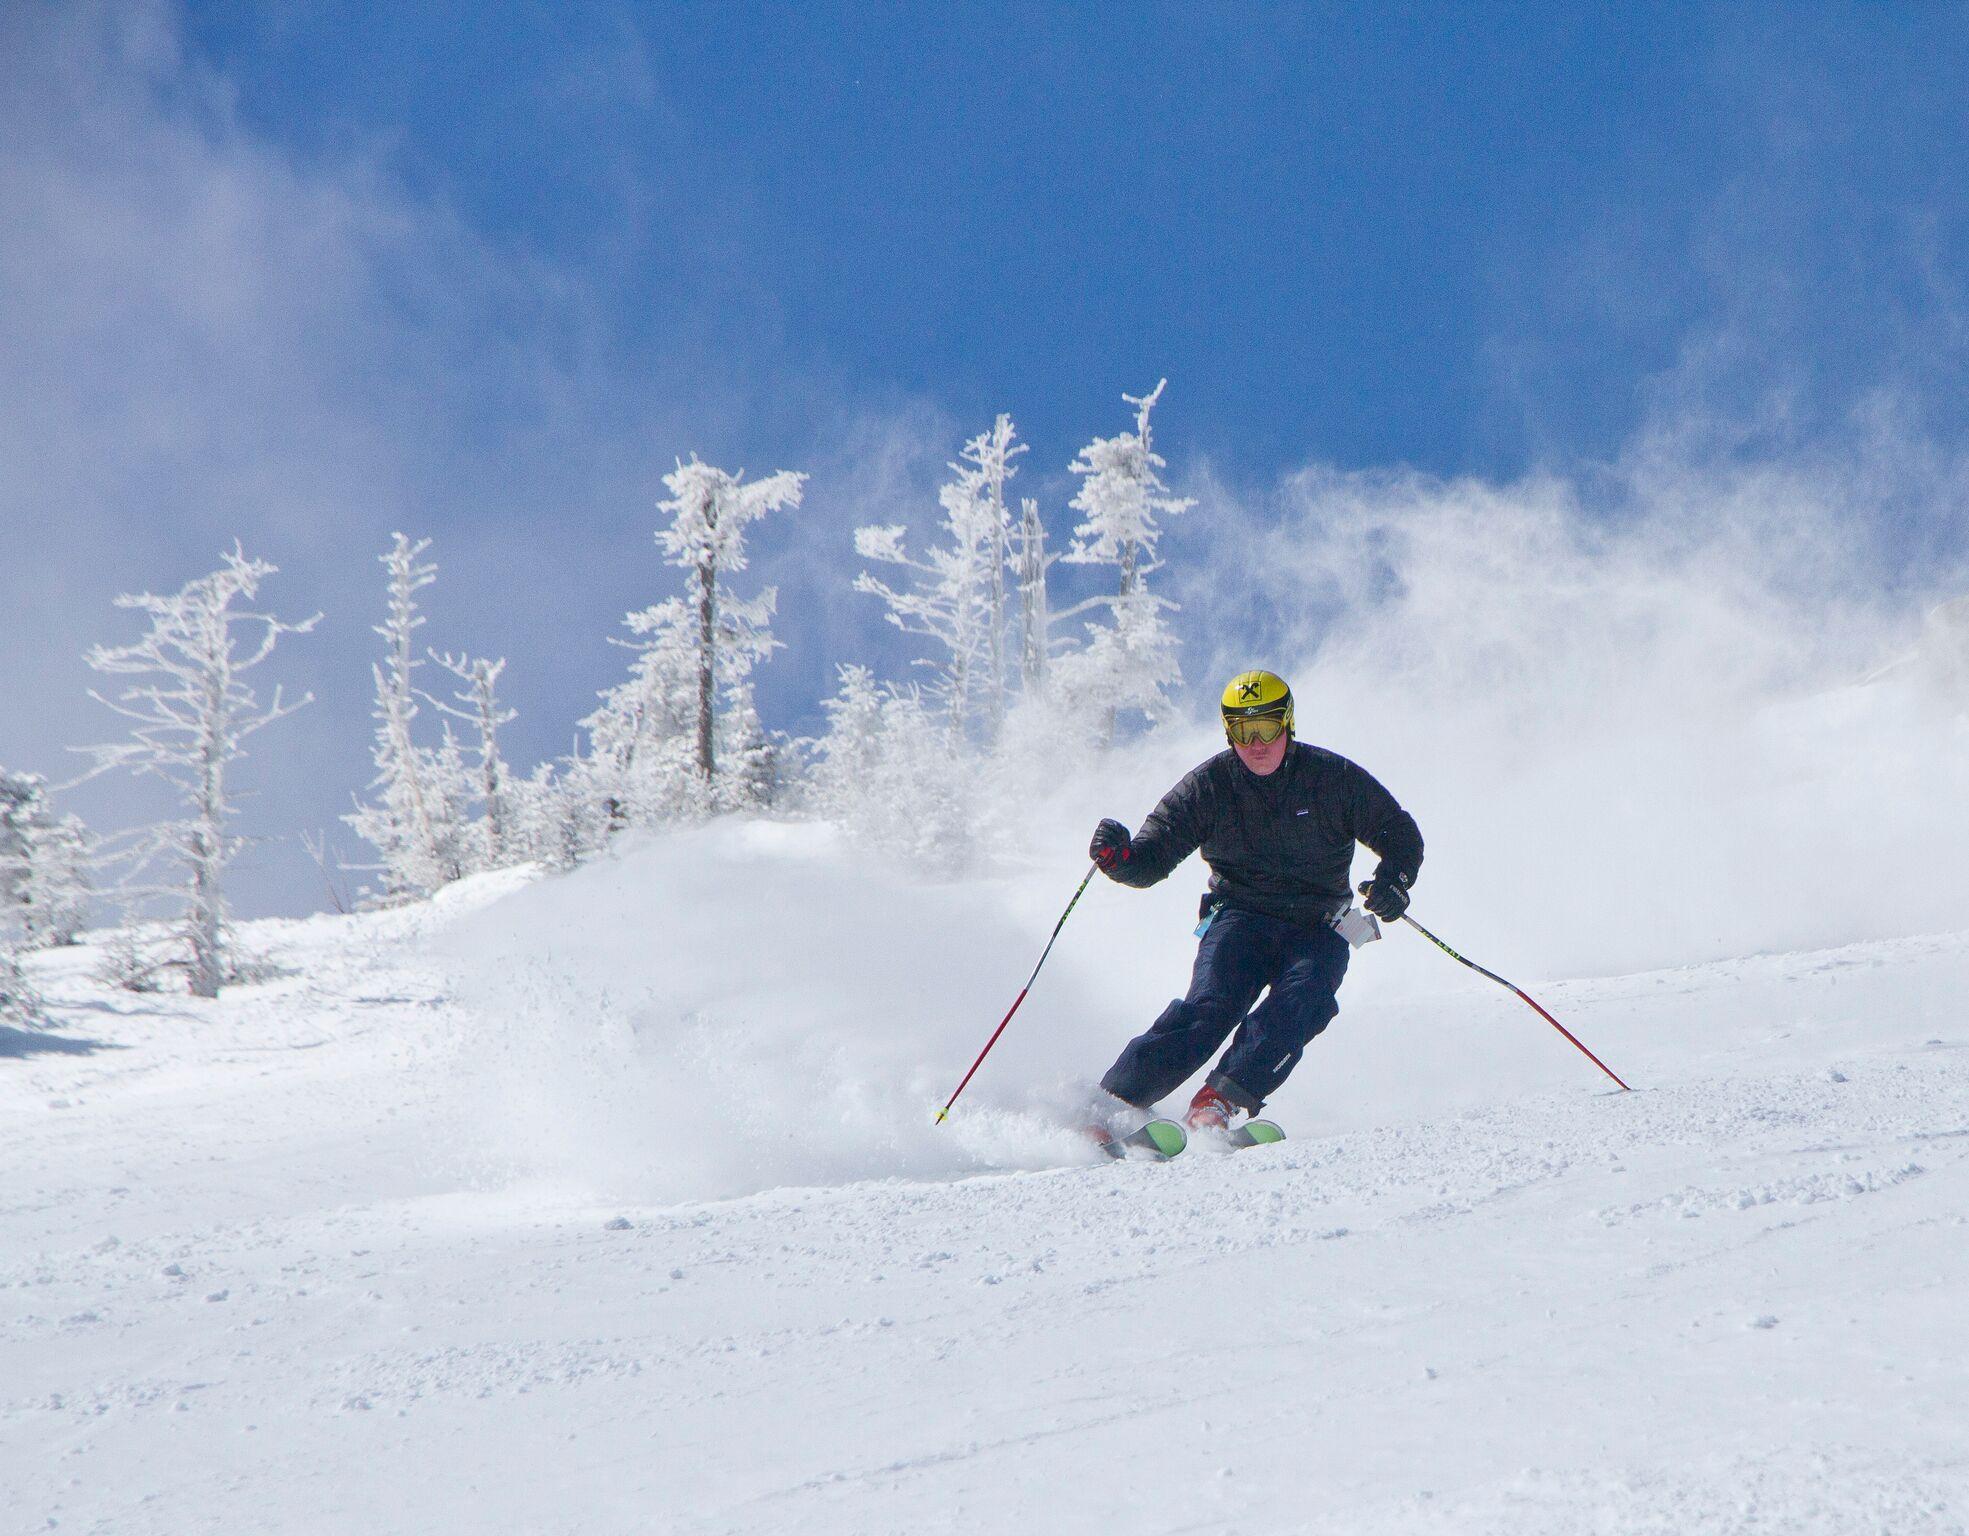 Northeast ski craft beer showcase to feature new for Northeast ski and craft beer showcase